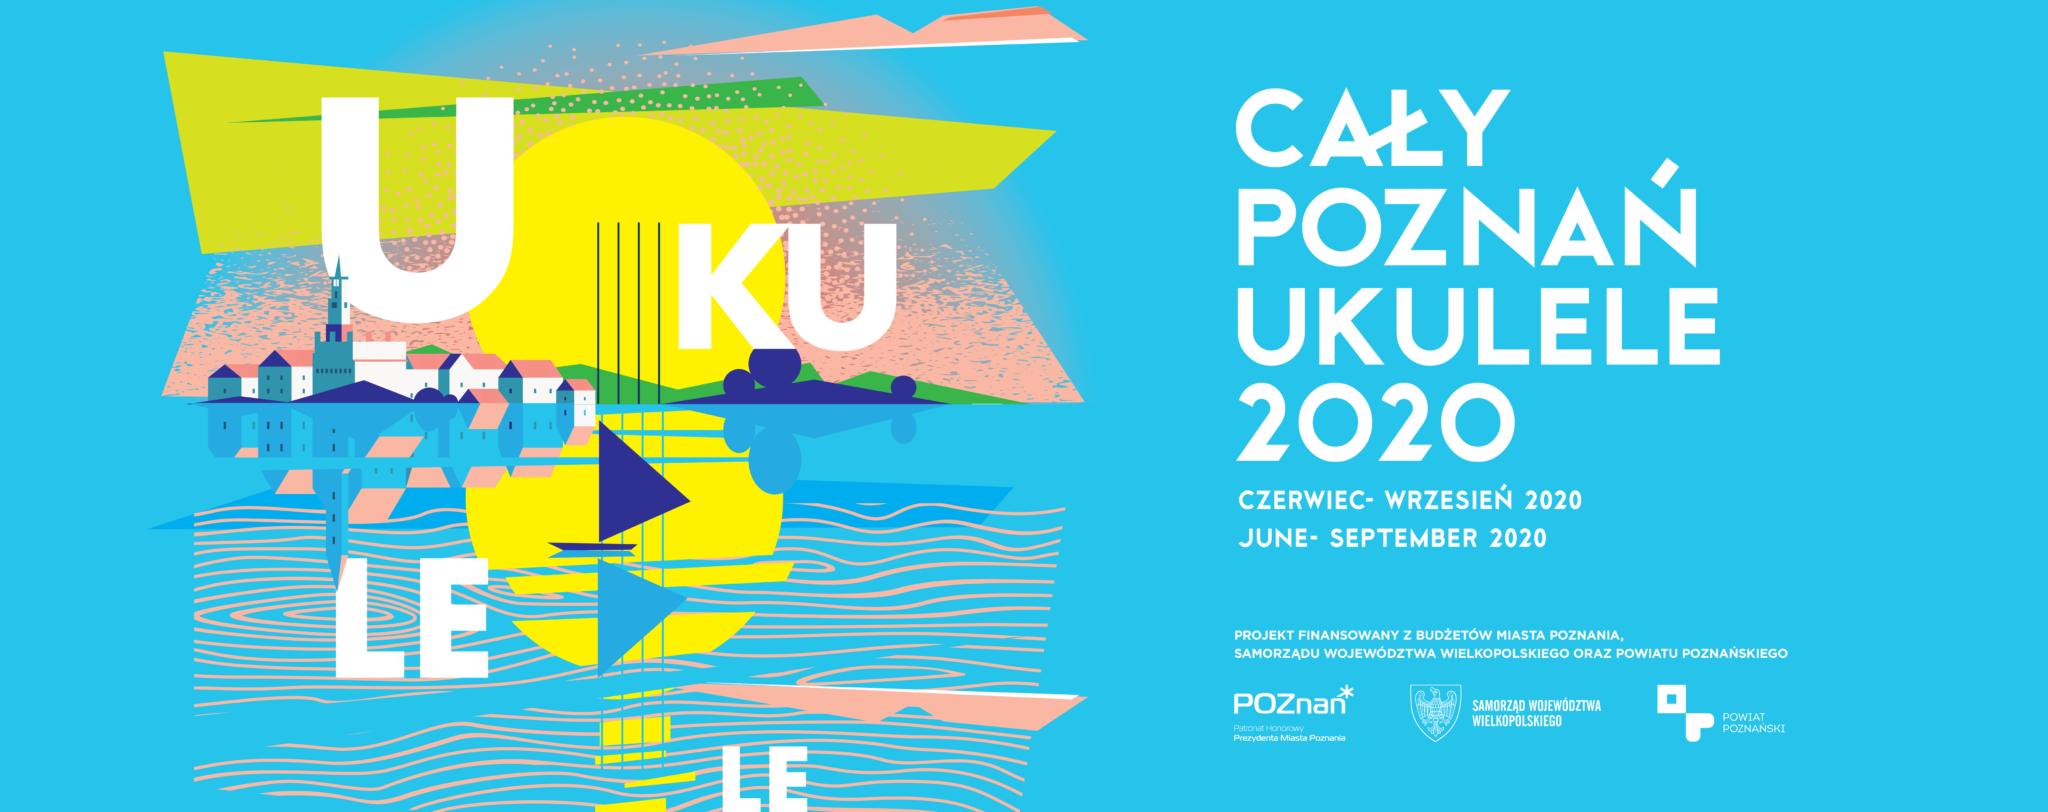 Cały Poznań Ukulele 2020!